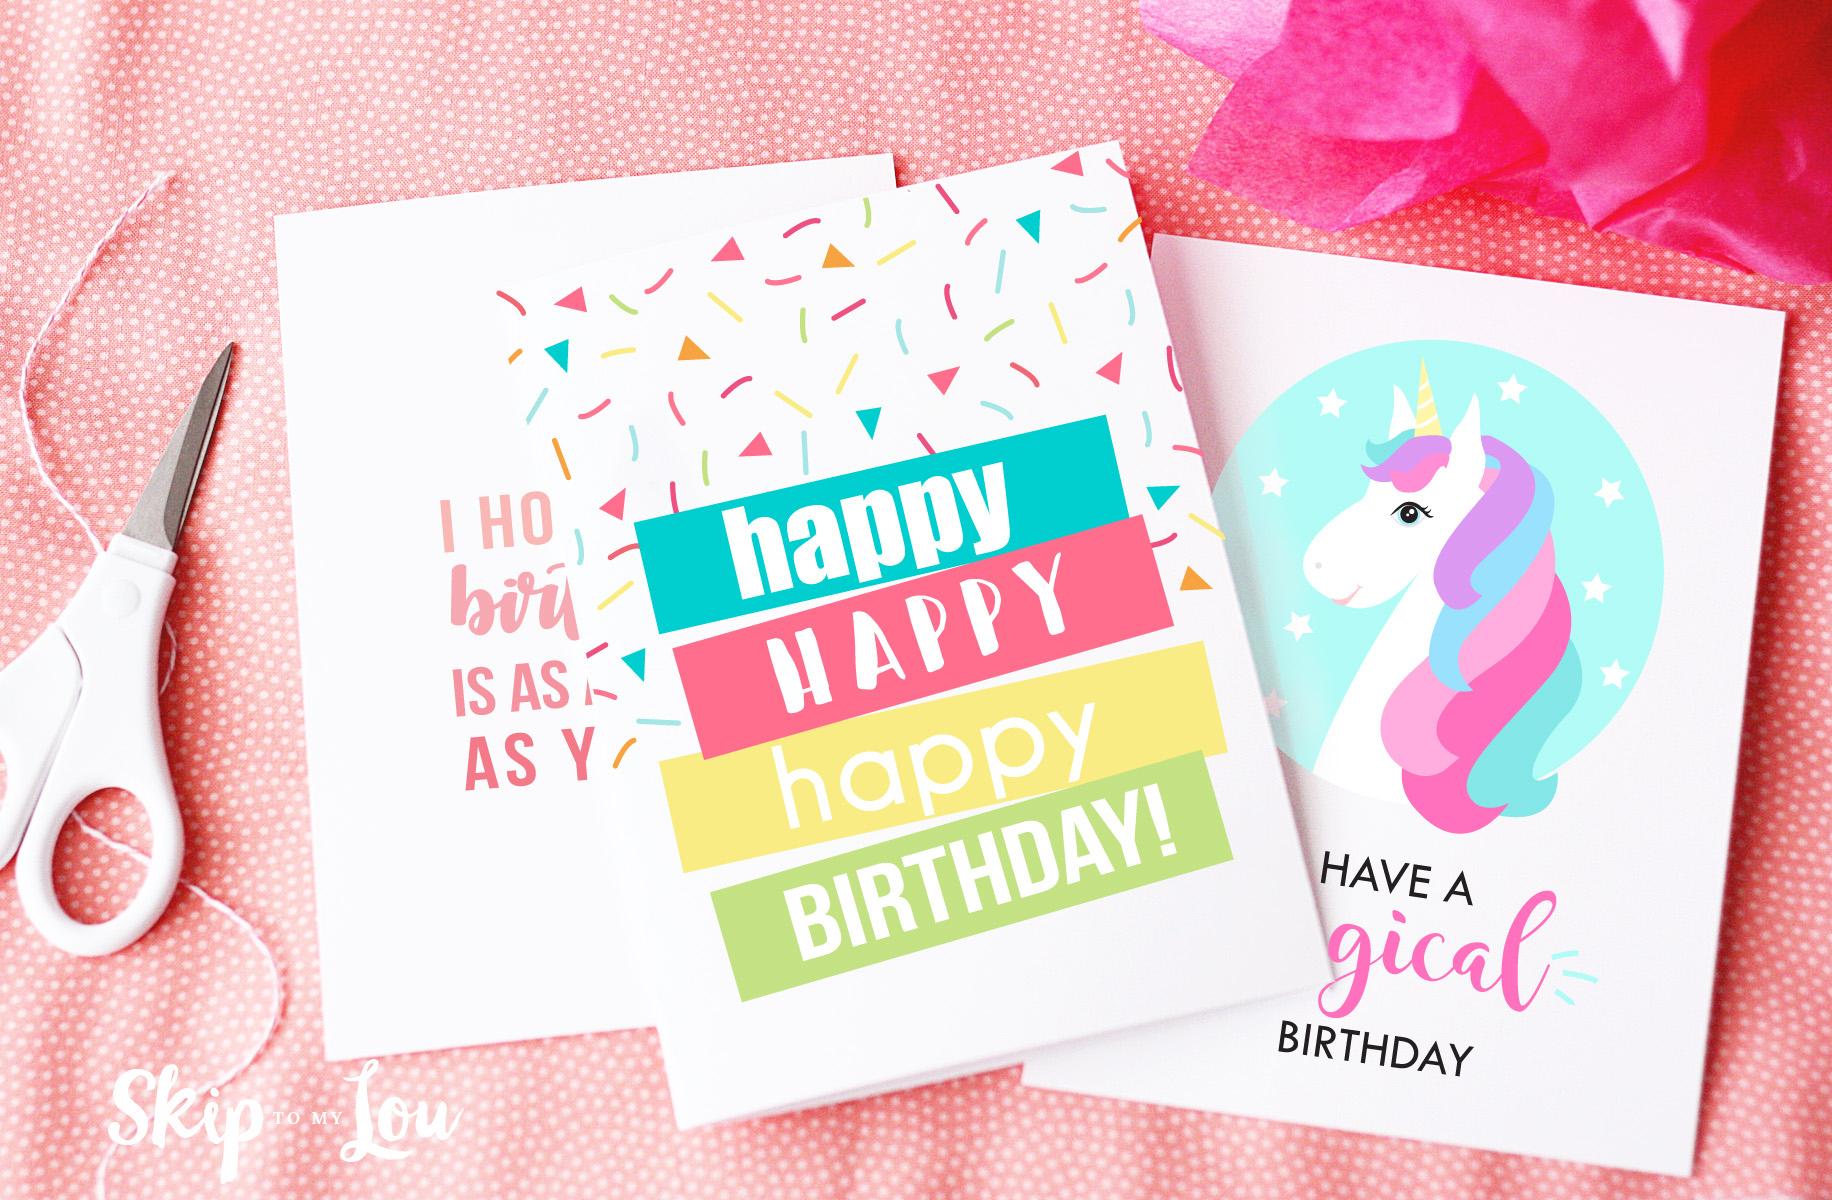 Free Printable Birthday Cards | Skip To My Lou - Free Printable Birthday Cards For Her